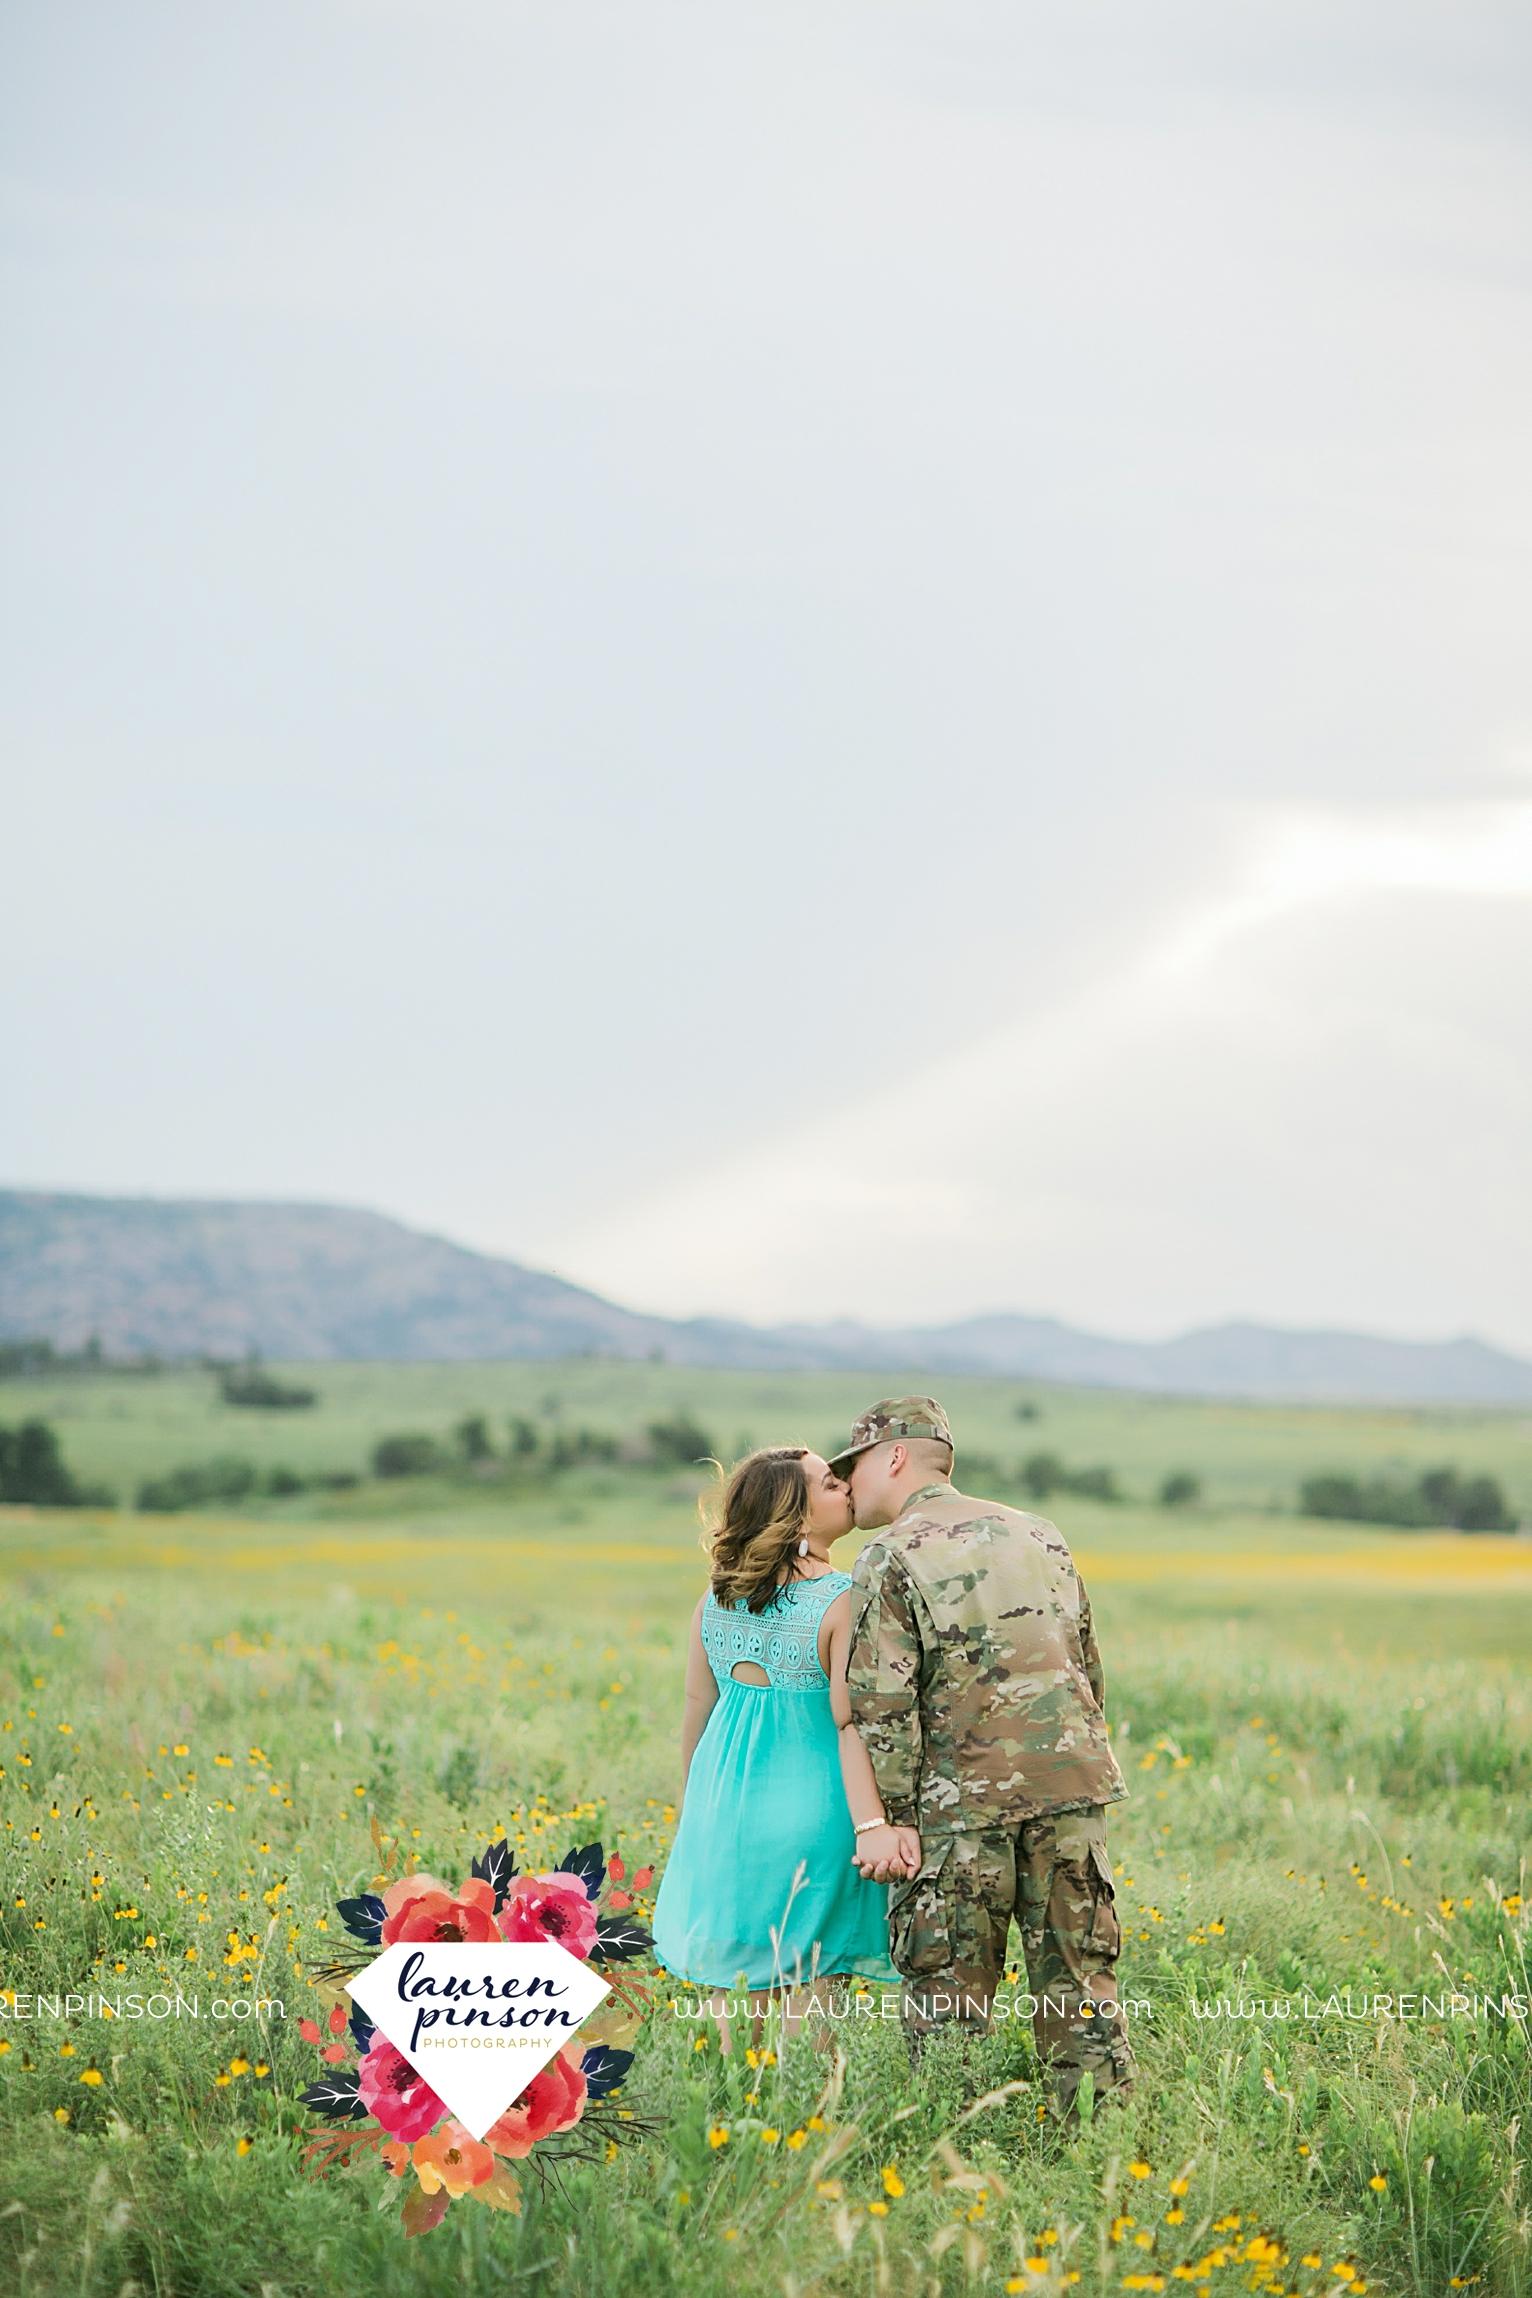 wichita-falls-texas-wedding-photography-engagement-session-army-fort-sill-lawton-oklahoma-wichita-mountains-newlyweds-00010.jpg